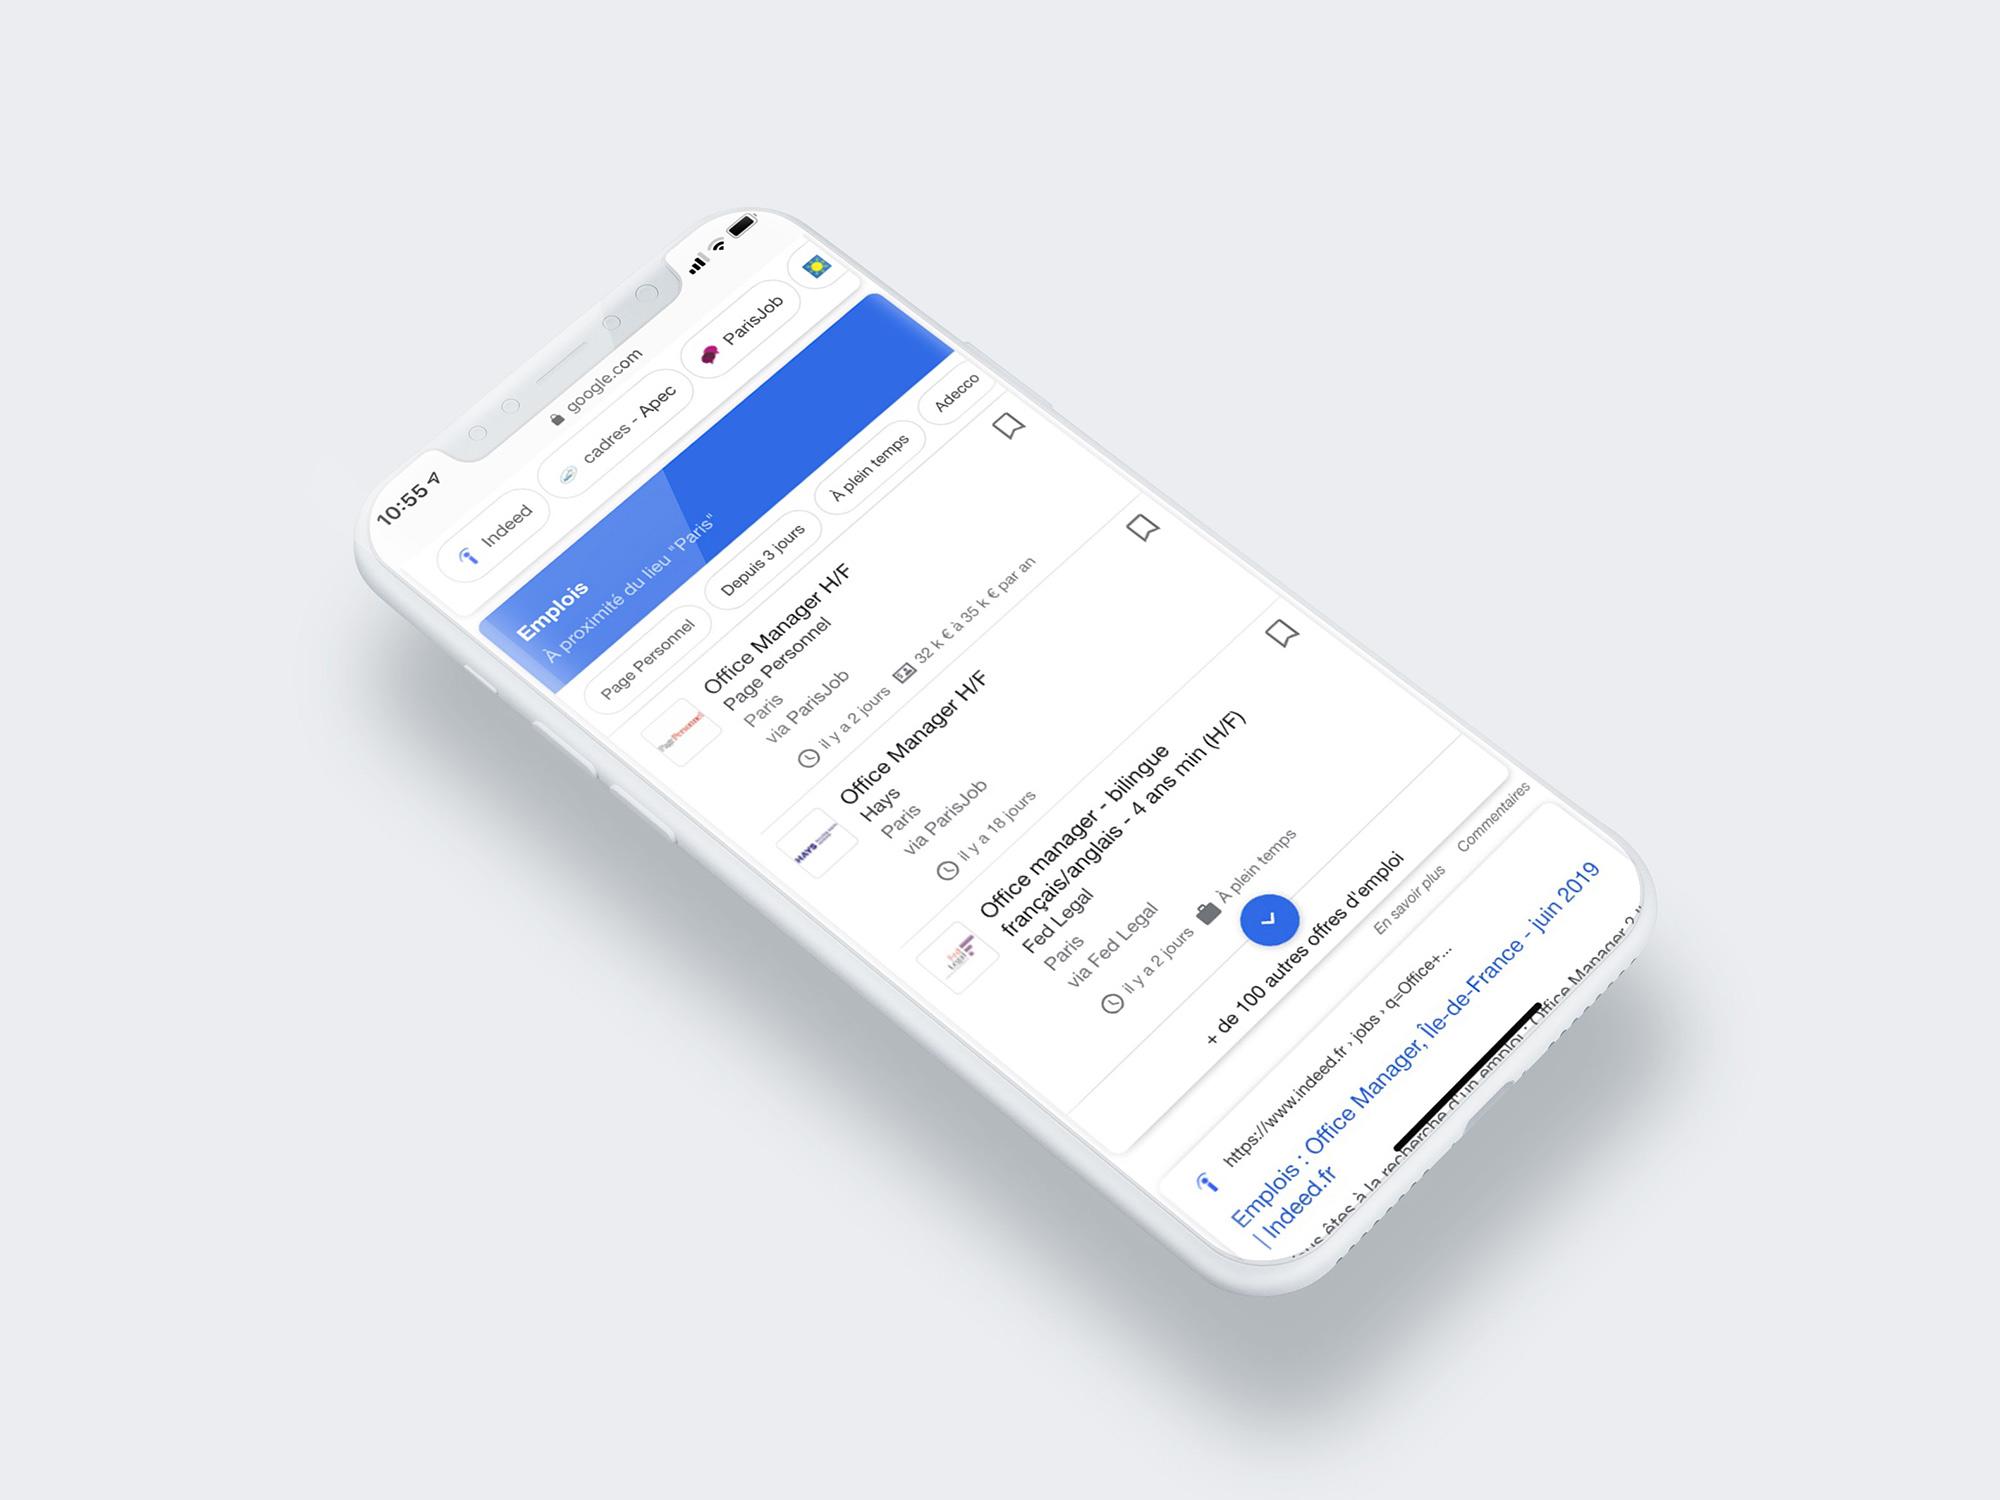 moteur de recherche d'emploi Google